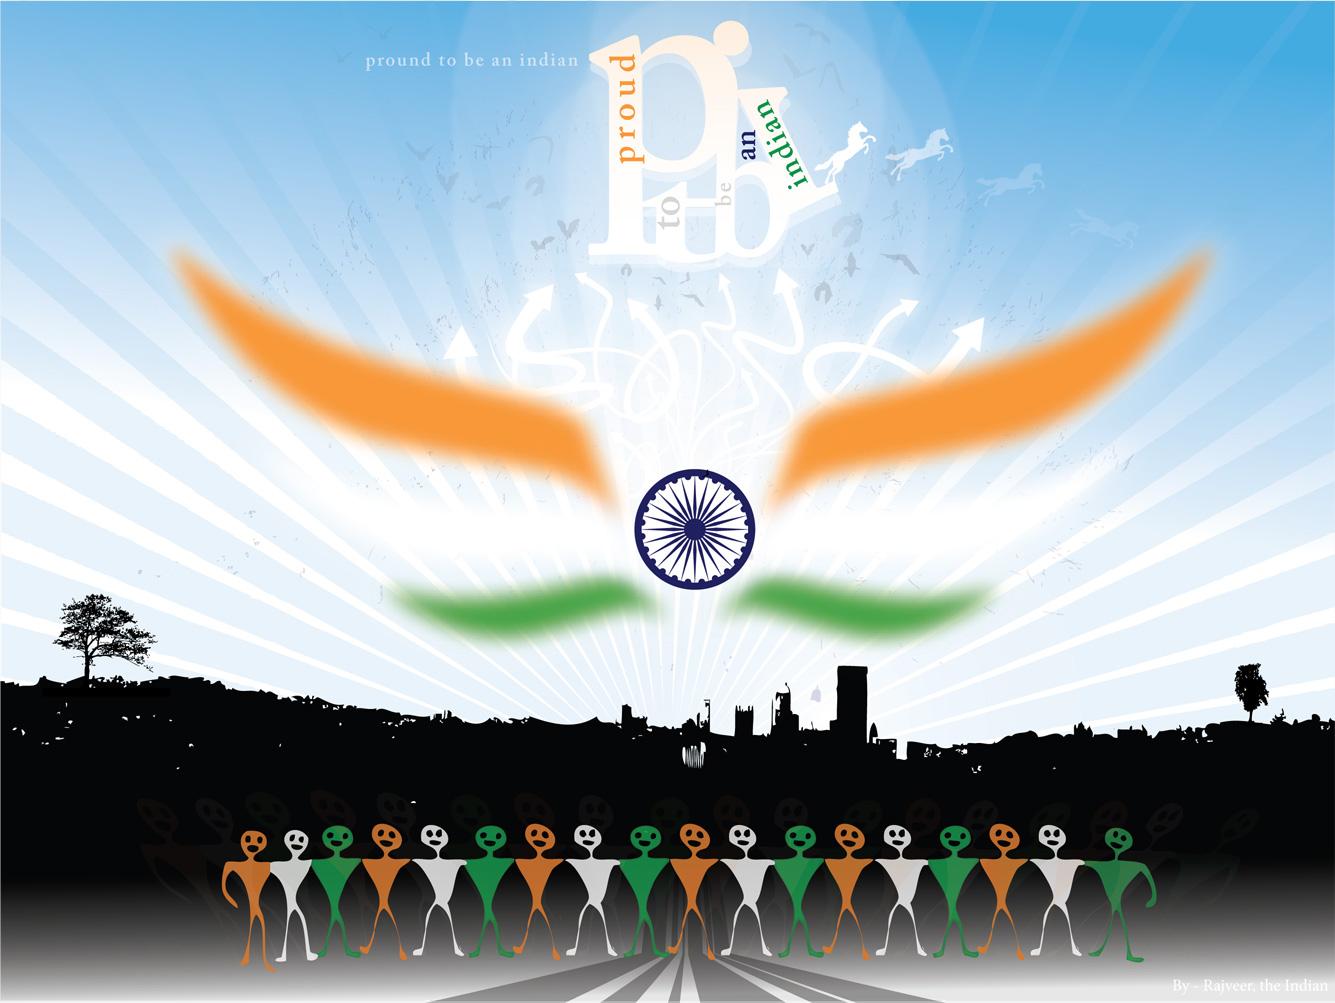 http://4.bp.blogspot.com/_qVjeg4Bd-q8/TF-2emgwZjI/AAAAAAAAABE/SFkPm_H4LRg/s1600/indian-flag-24.jpg